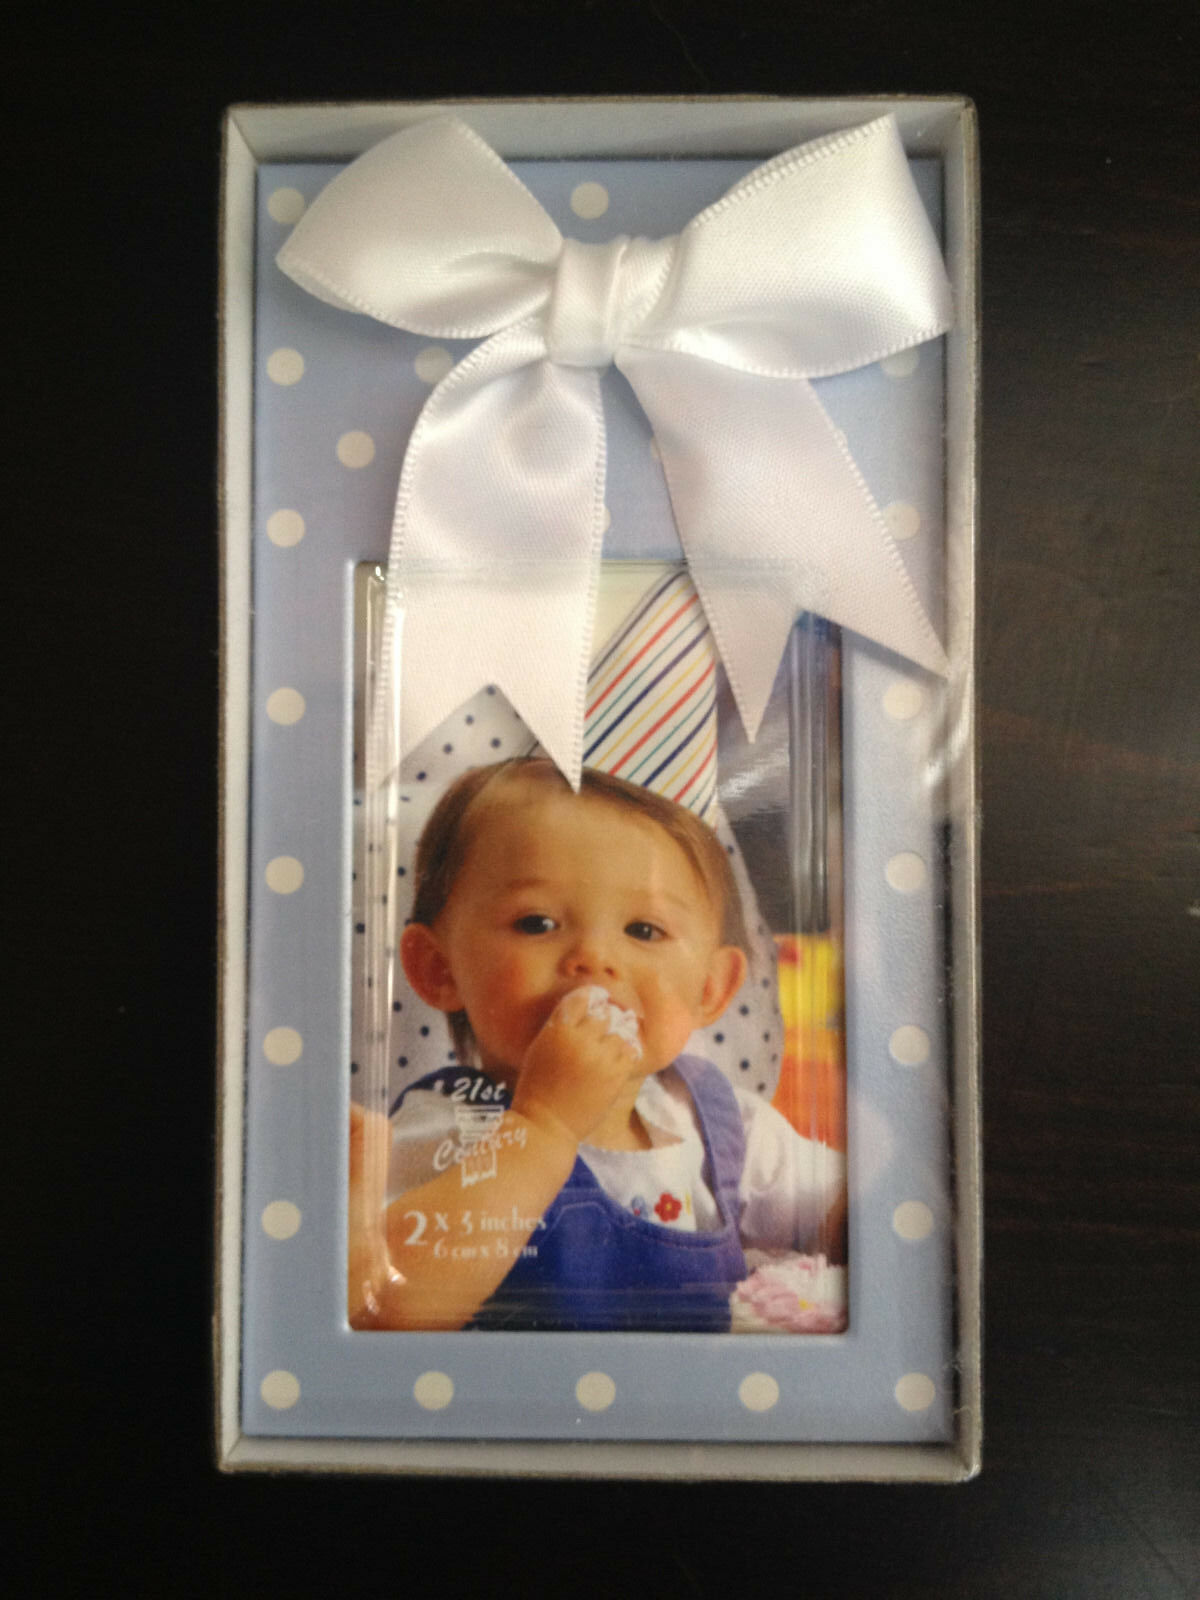 25 2x3 Blau Polka Dot Frame w  Weiß Bow - BABY SHOWER FAVORS